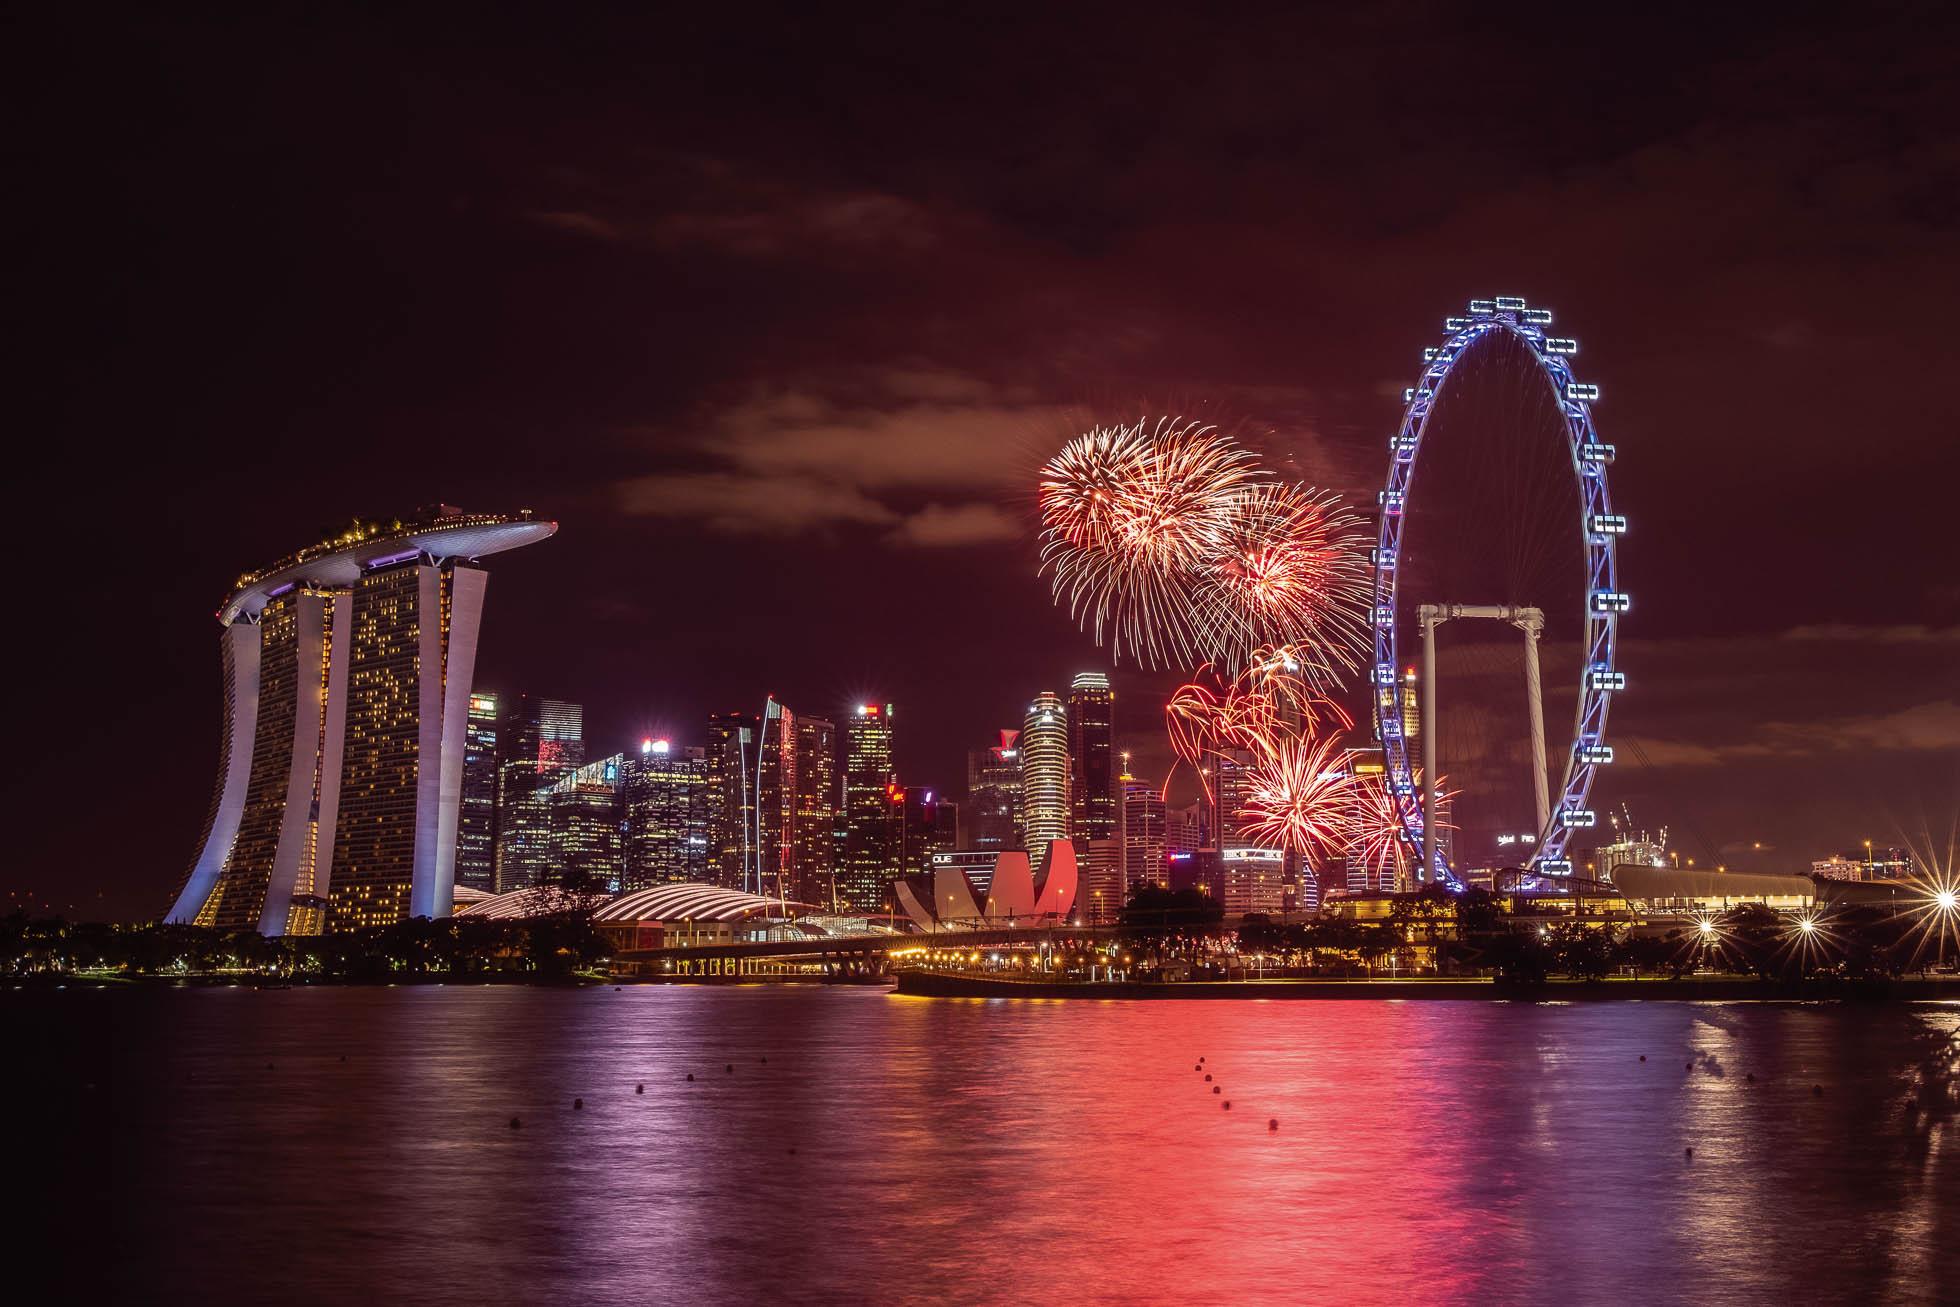 photographing fireworks by Shilpa Harolikar